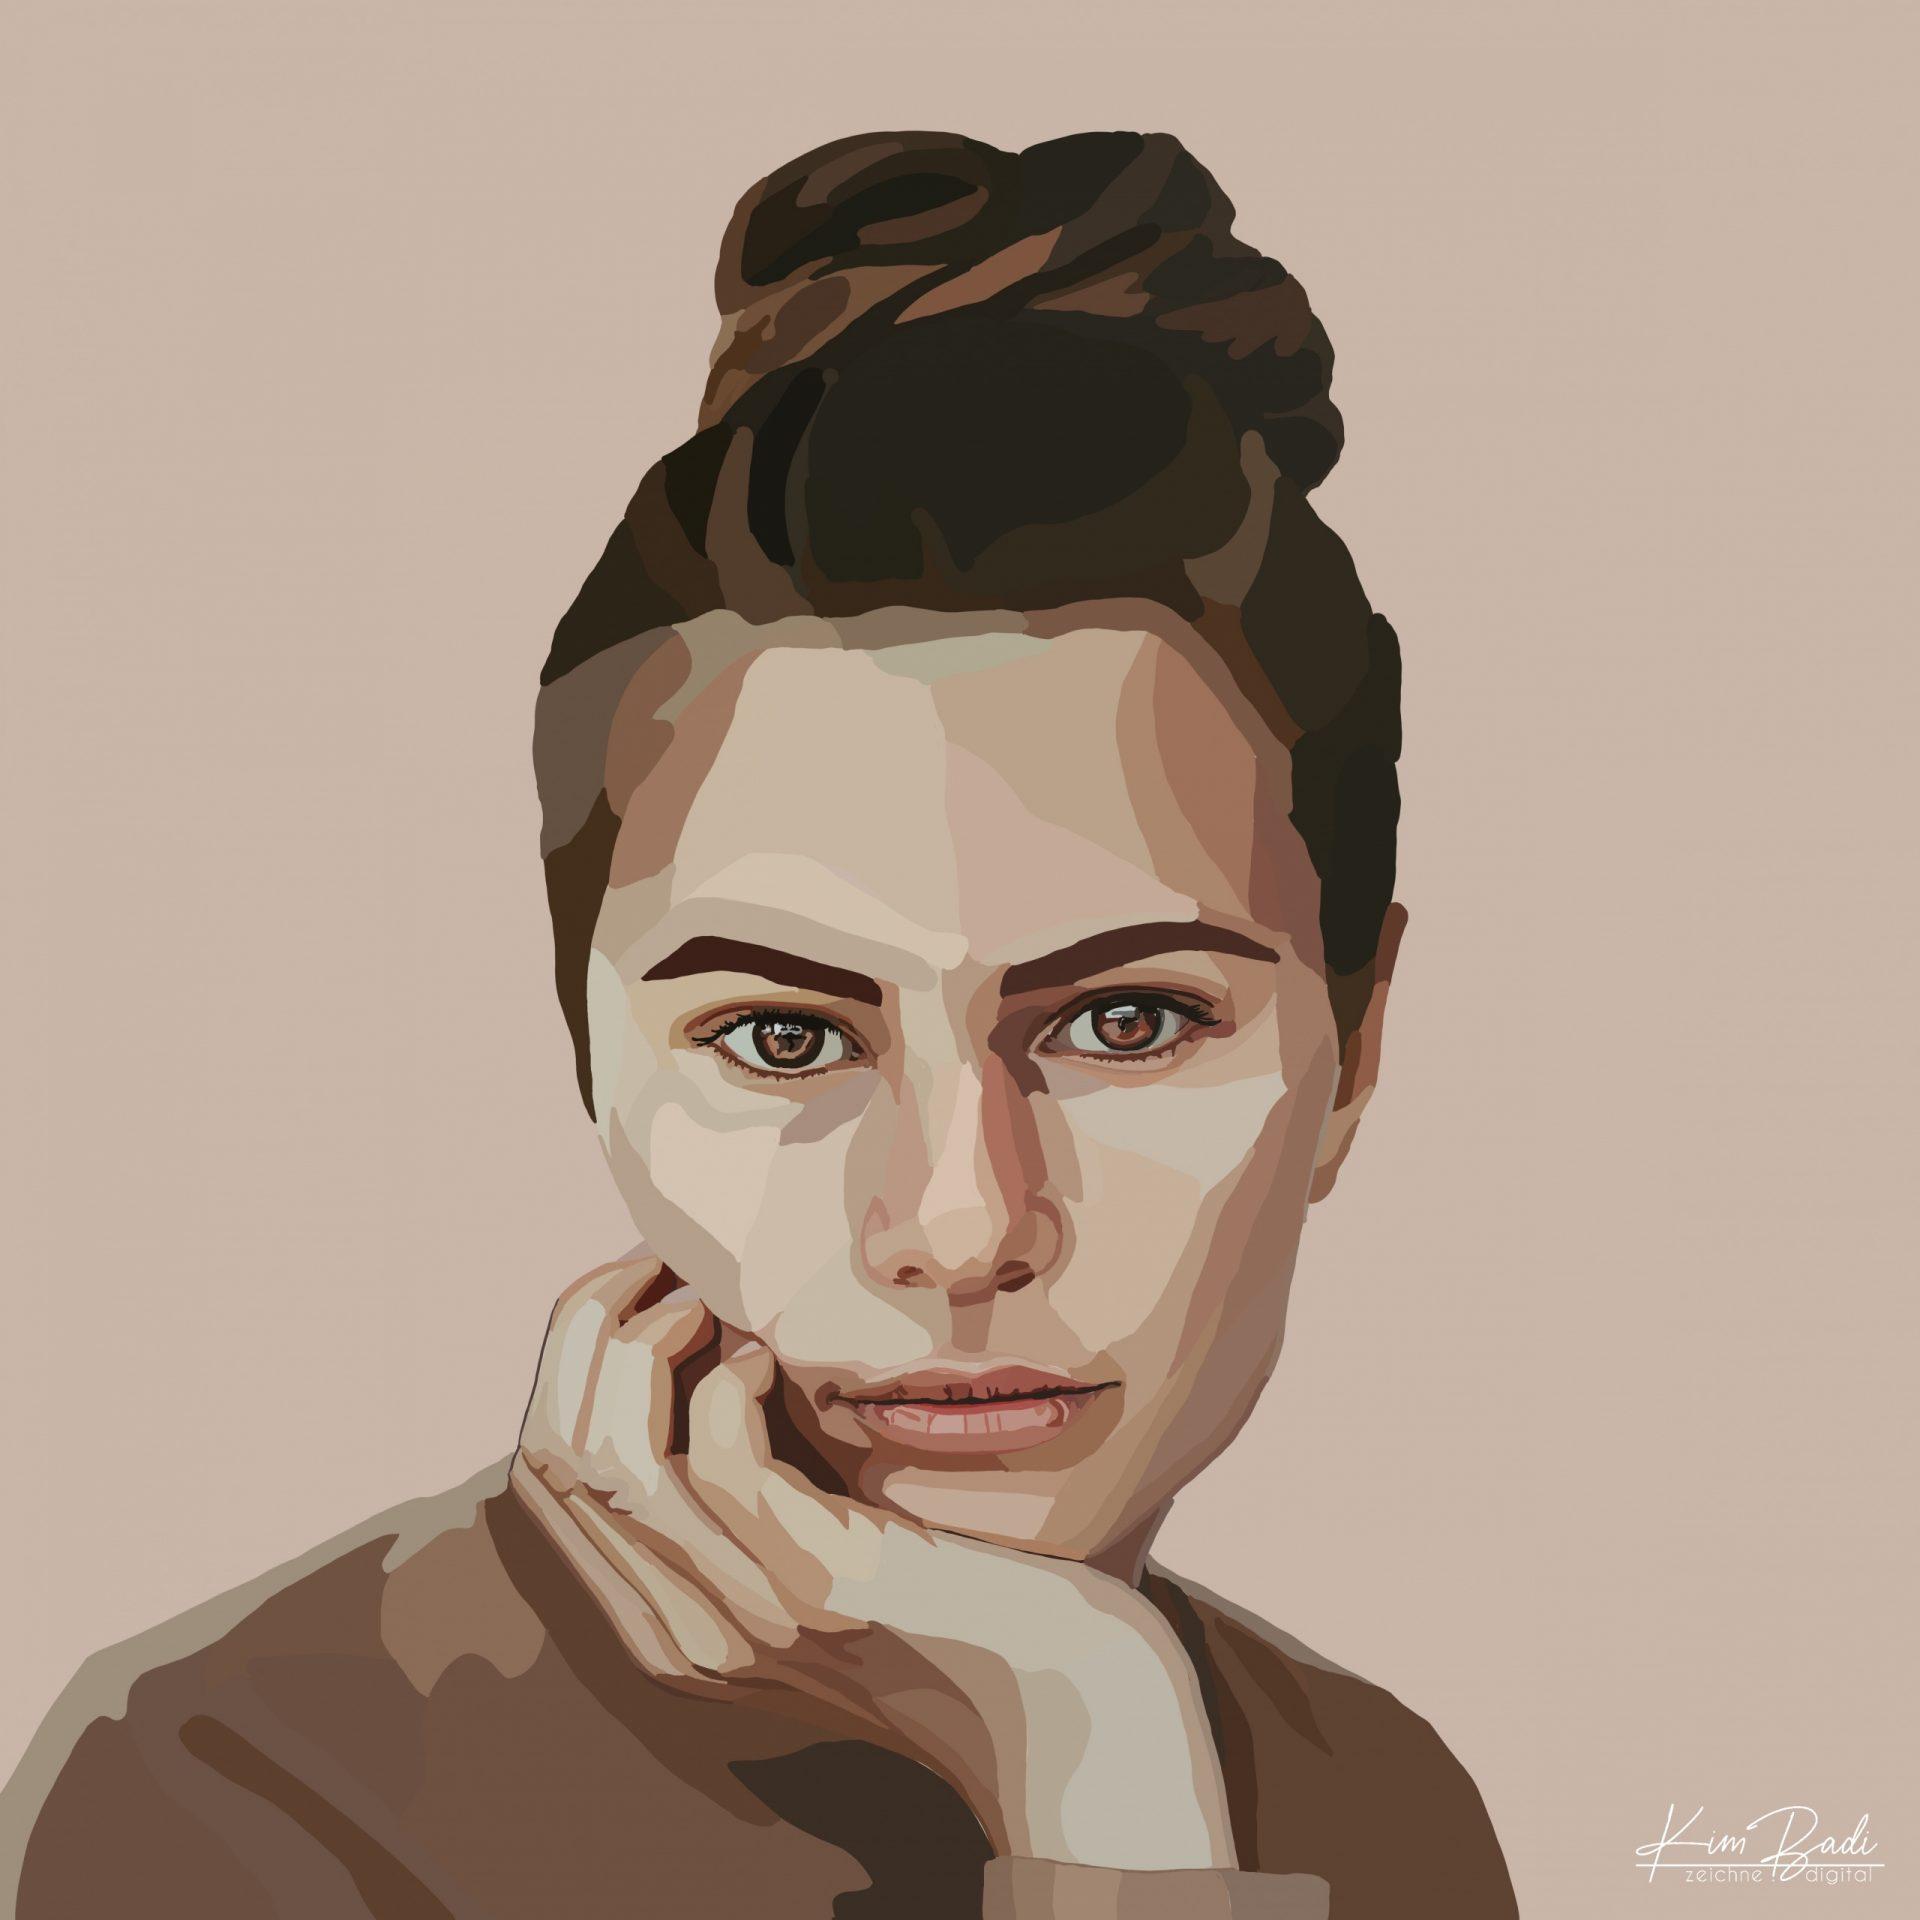 Kim Badi - digitale Kunst - Frau Portrait auf der Webseite www.kimbadi.com